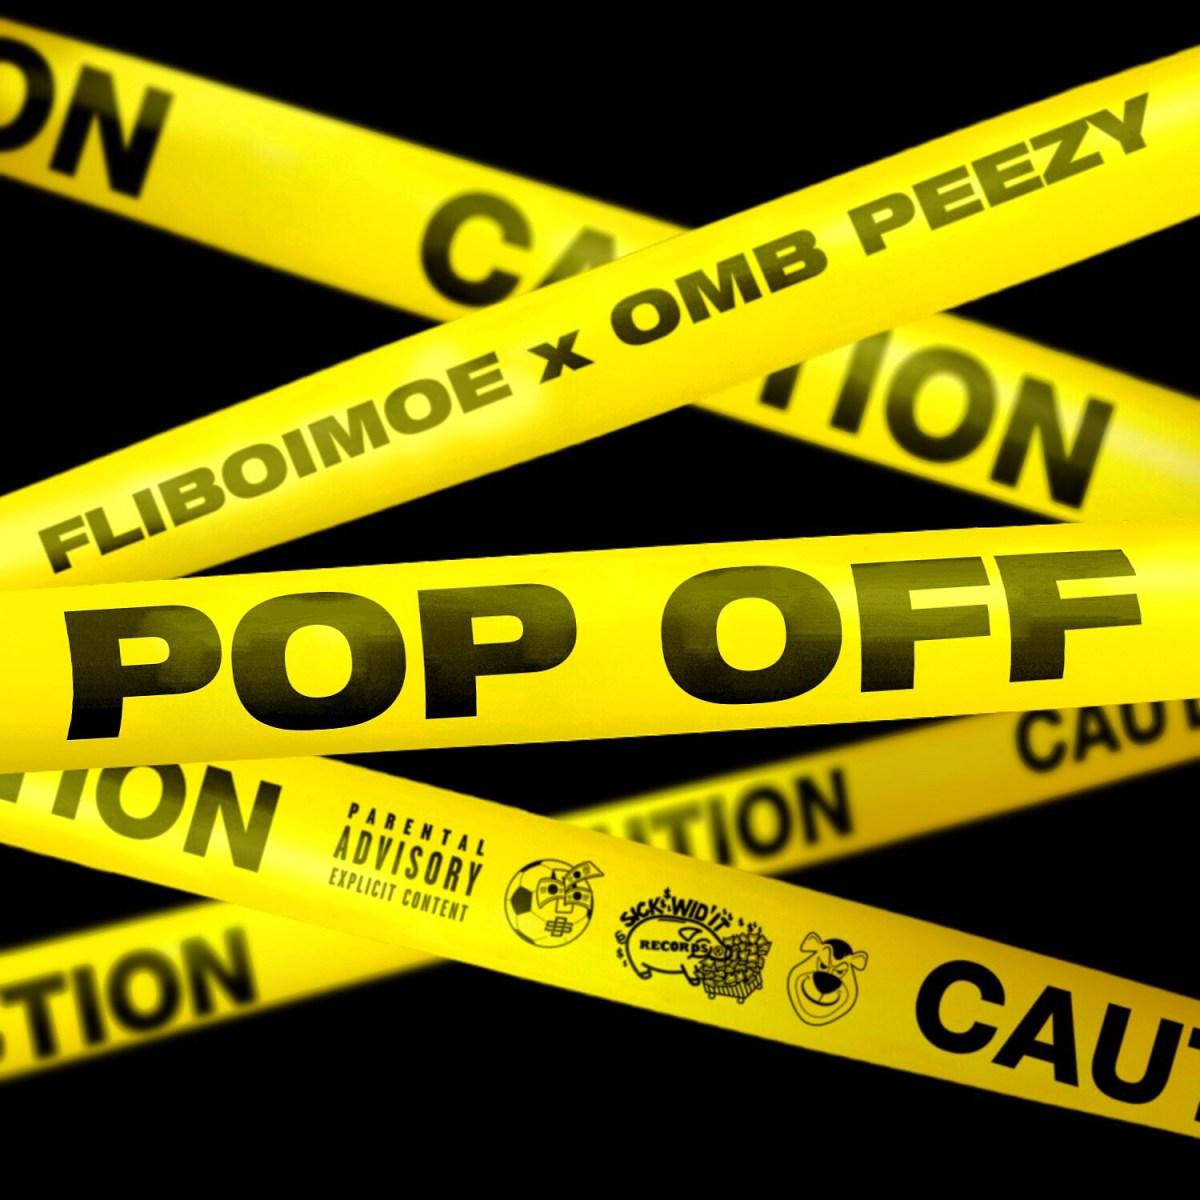 FLIBOIMOE (@FLIBOIMOE) F/ OMB Peezy (@OMB_Peezy) - Pop Off